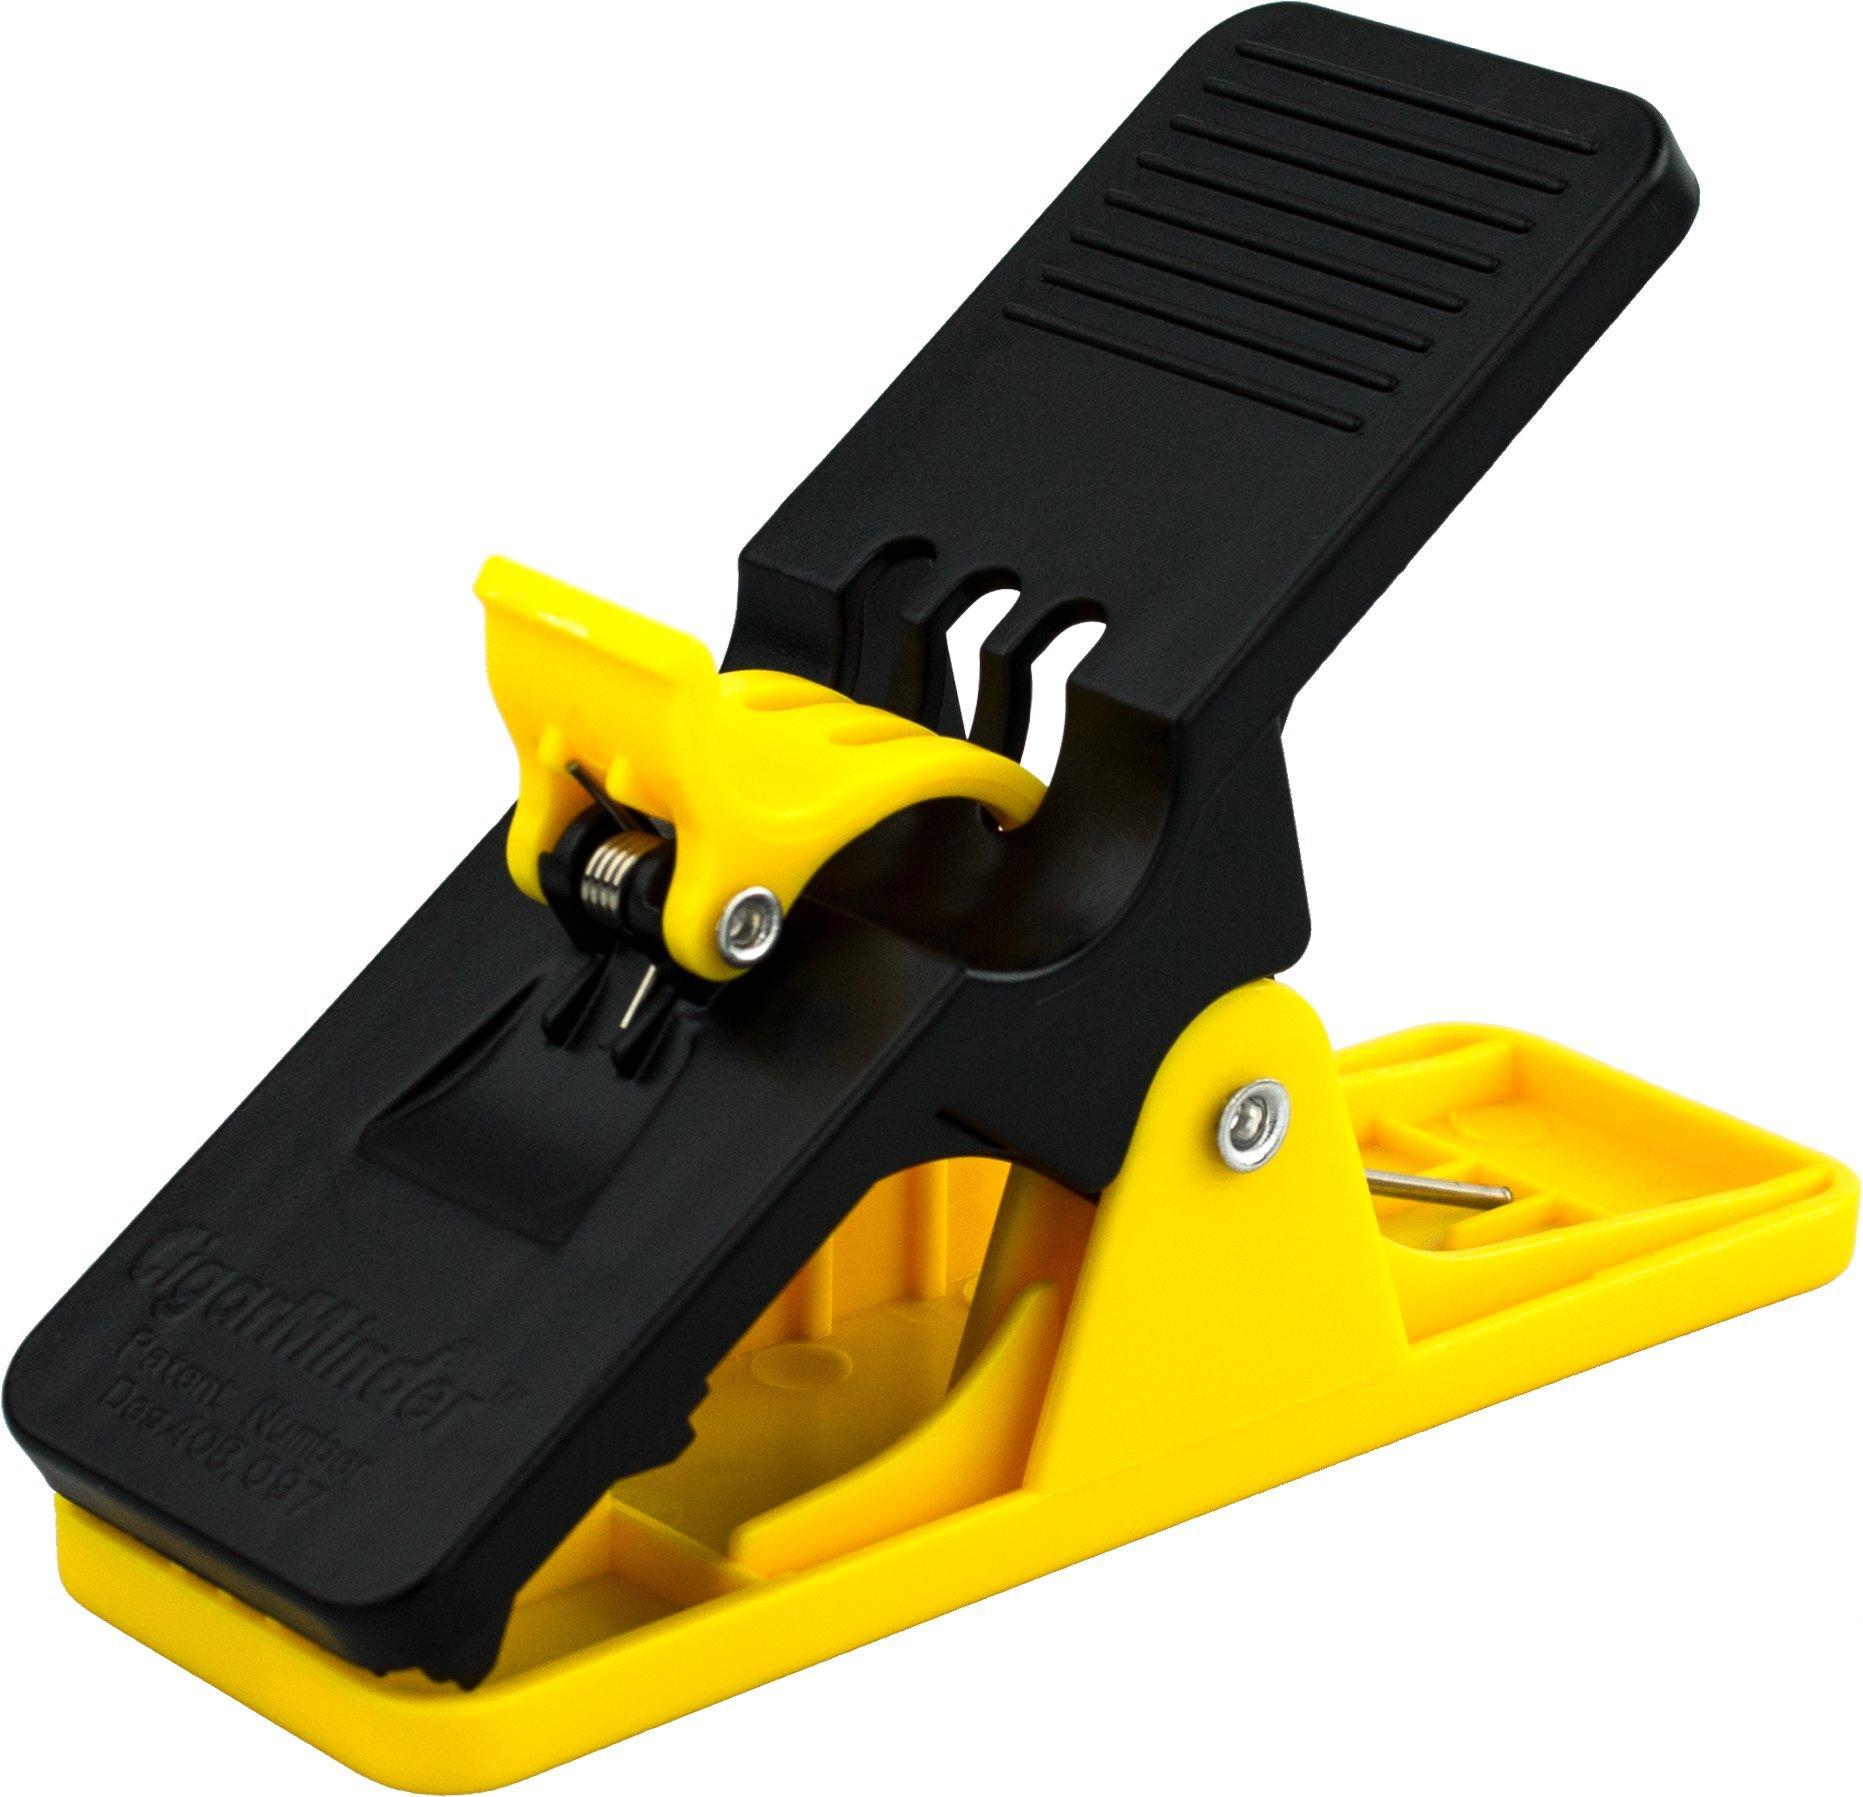 Cigar Minder Clip -  All Purpose Cigar Holder (Yellow)